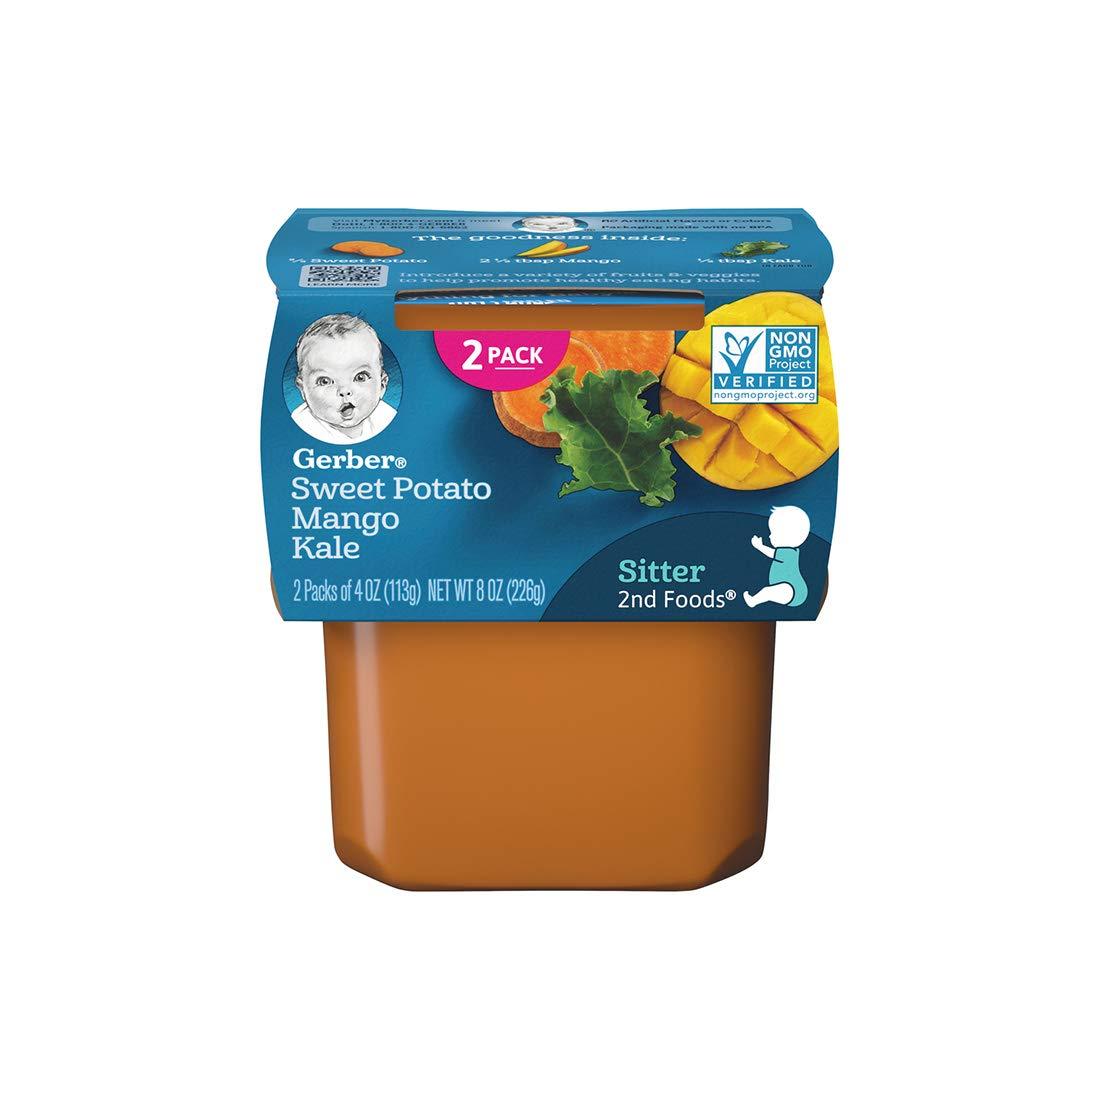 Gerber Purees 2nd Foods Sweet Potato Mango Kale Baby Food, 4 oz, 2 ct